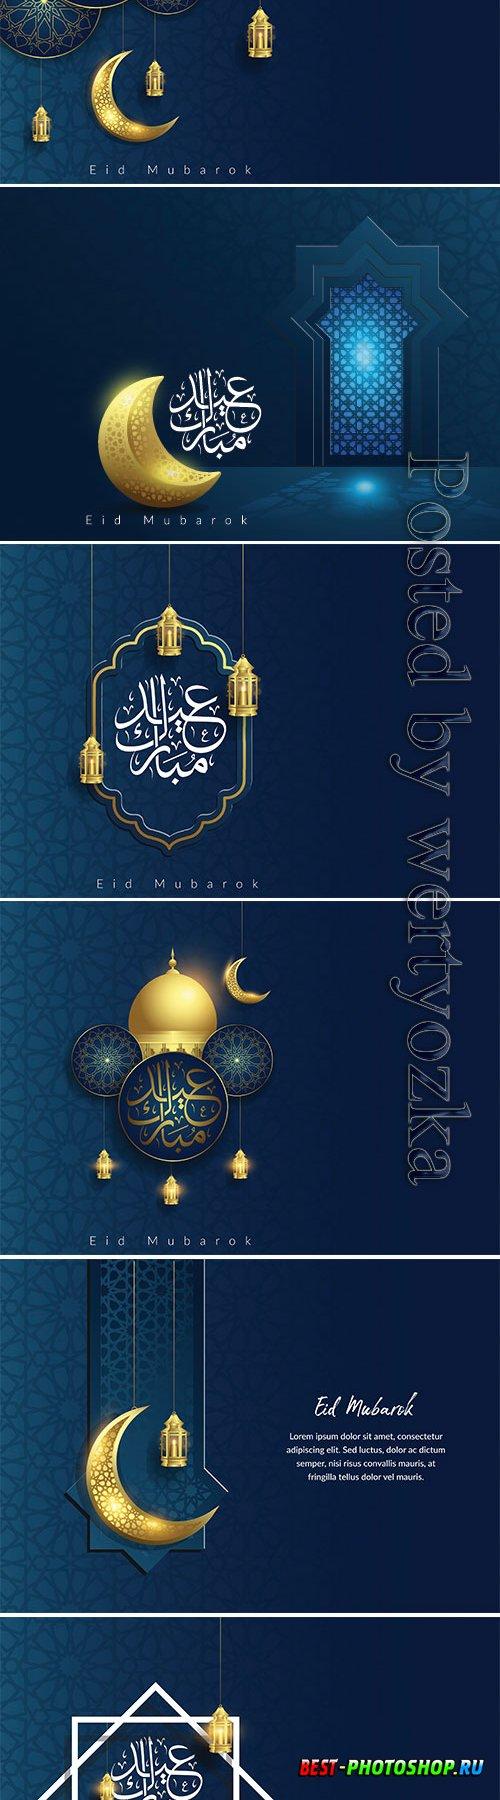 Eid mubarok islamic background template, Ramadan vector background